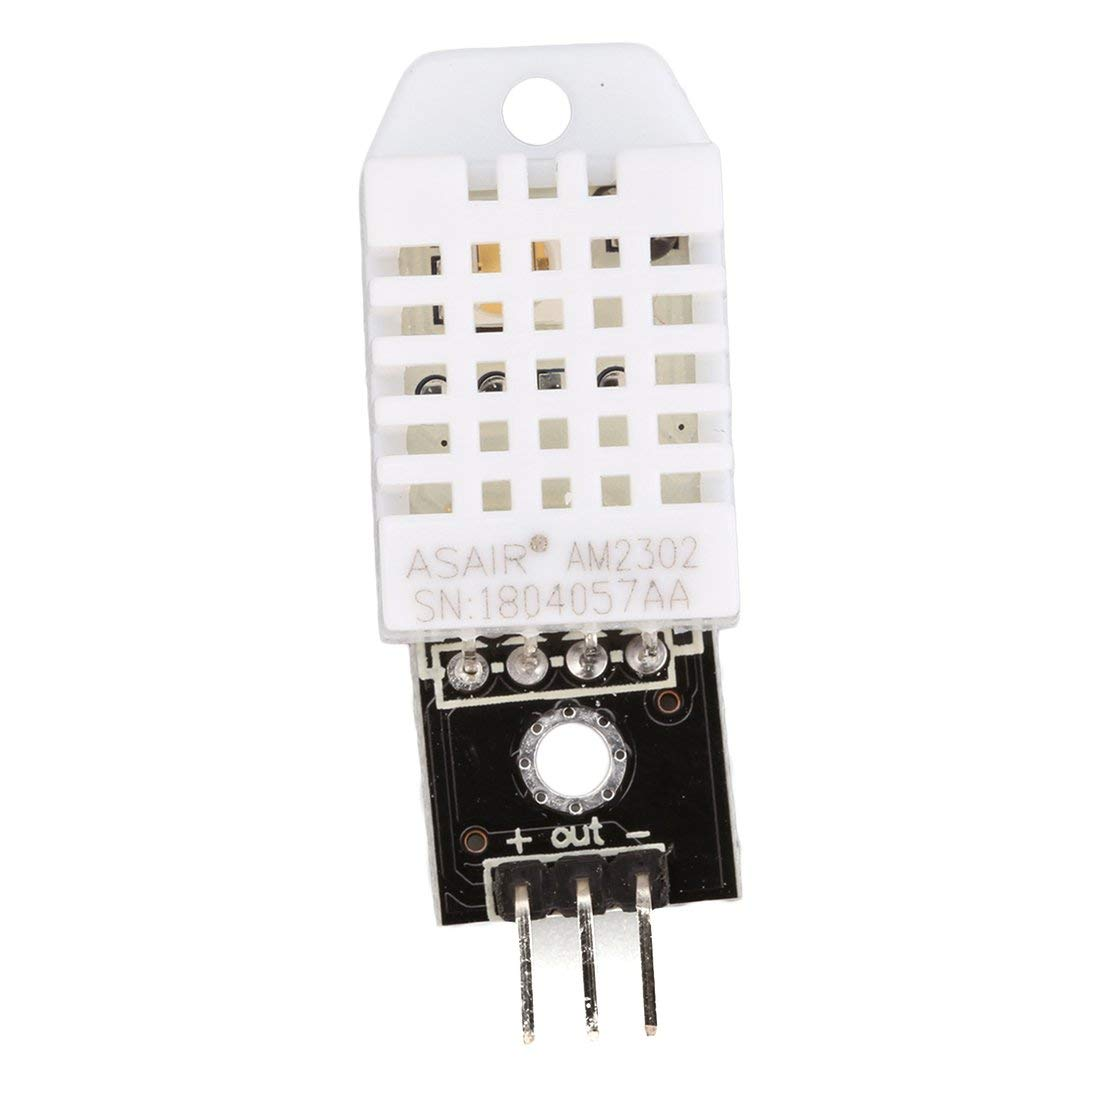 AM2302 Reemplace SHT11SHT15 Excelente Estabilidad a Largo Plazo Colorido Togames M/ódulo de Sensor de Temperatura y Humedad Digital DHT22